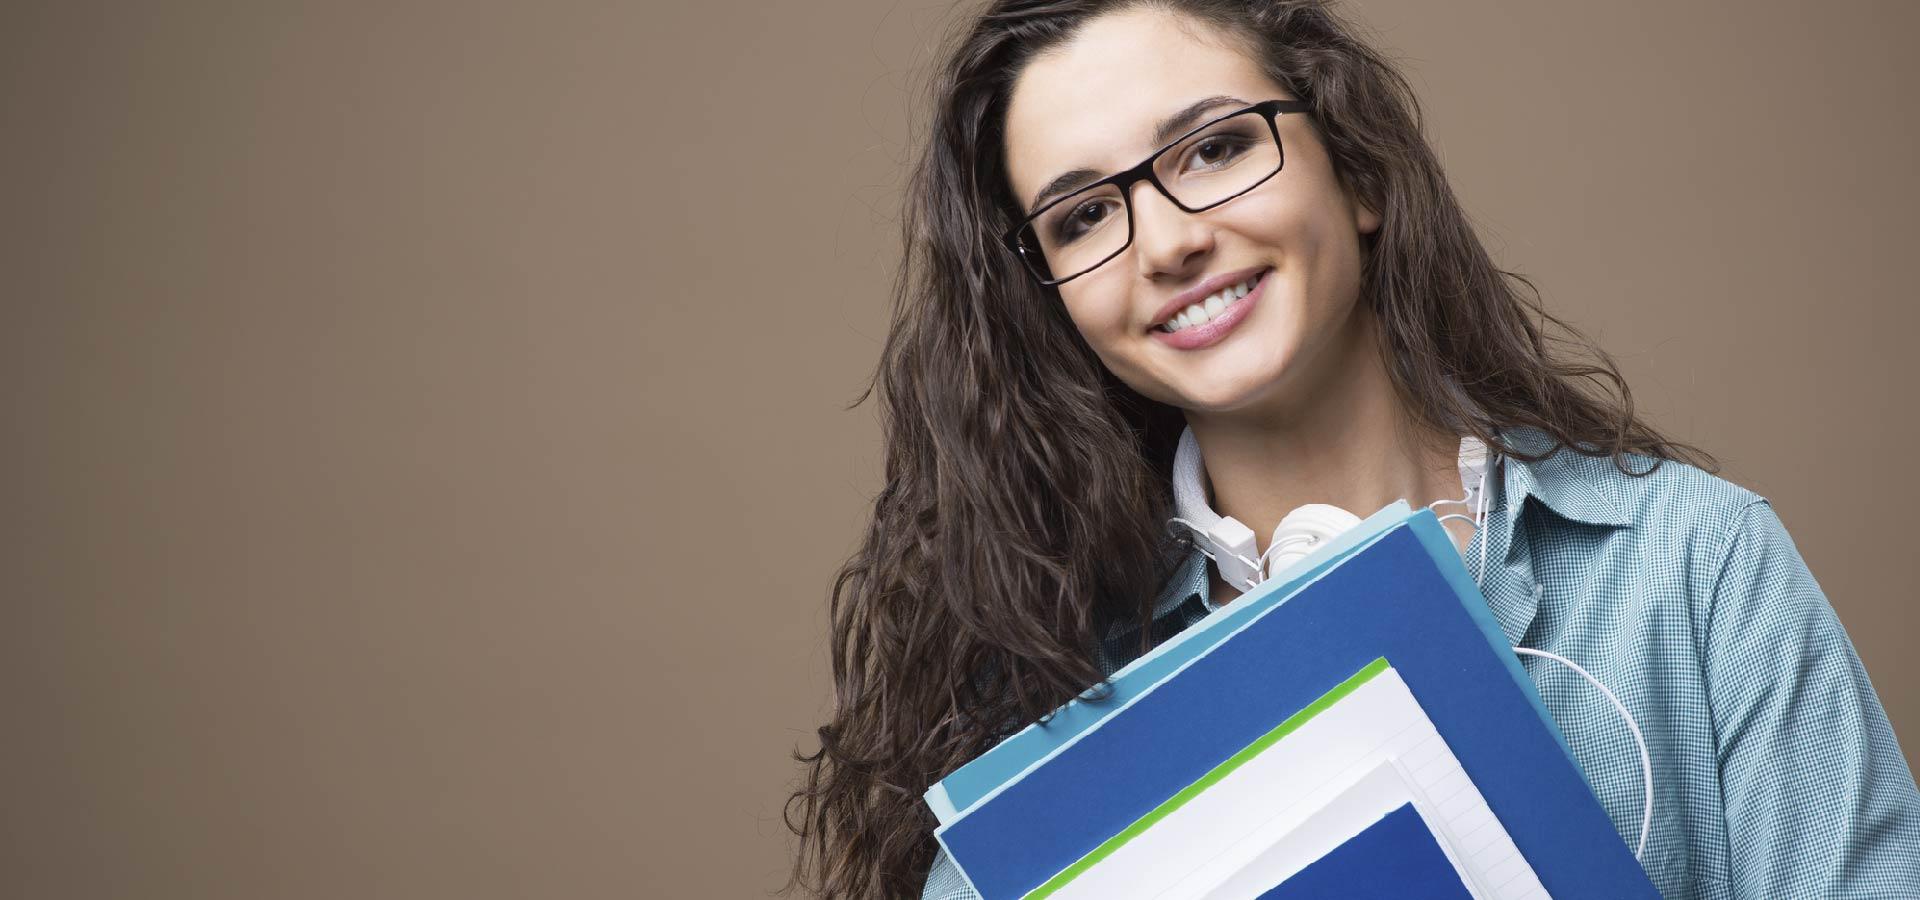 UNEG ISEC - Beneficios de cursar un posgrado Blog